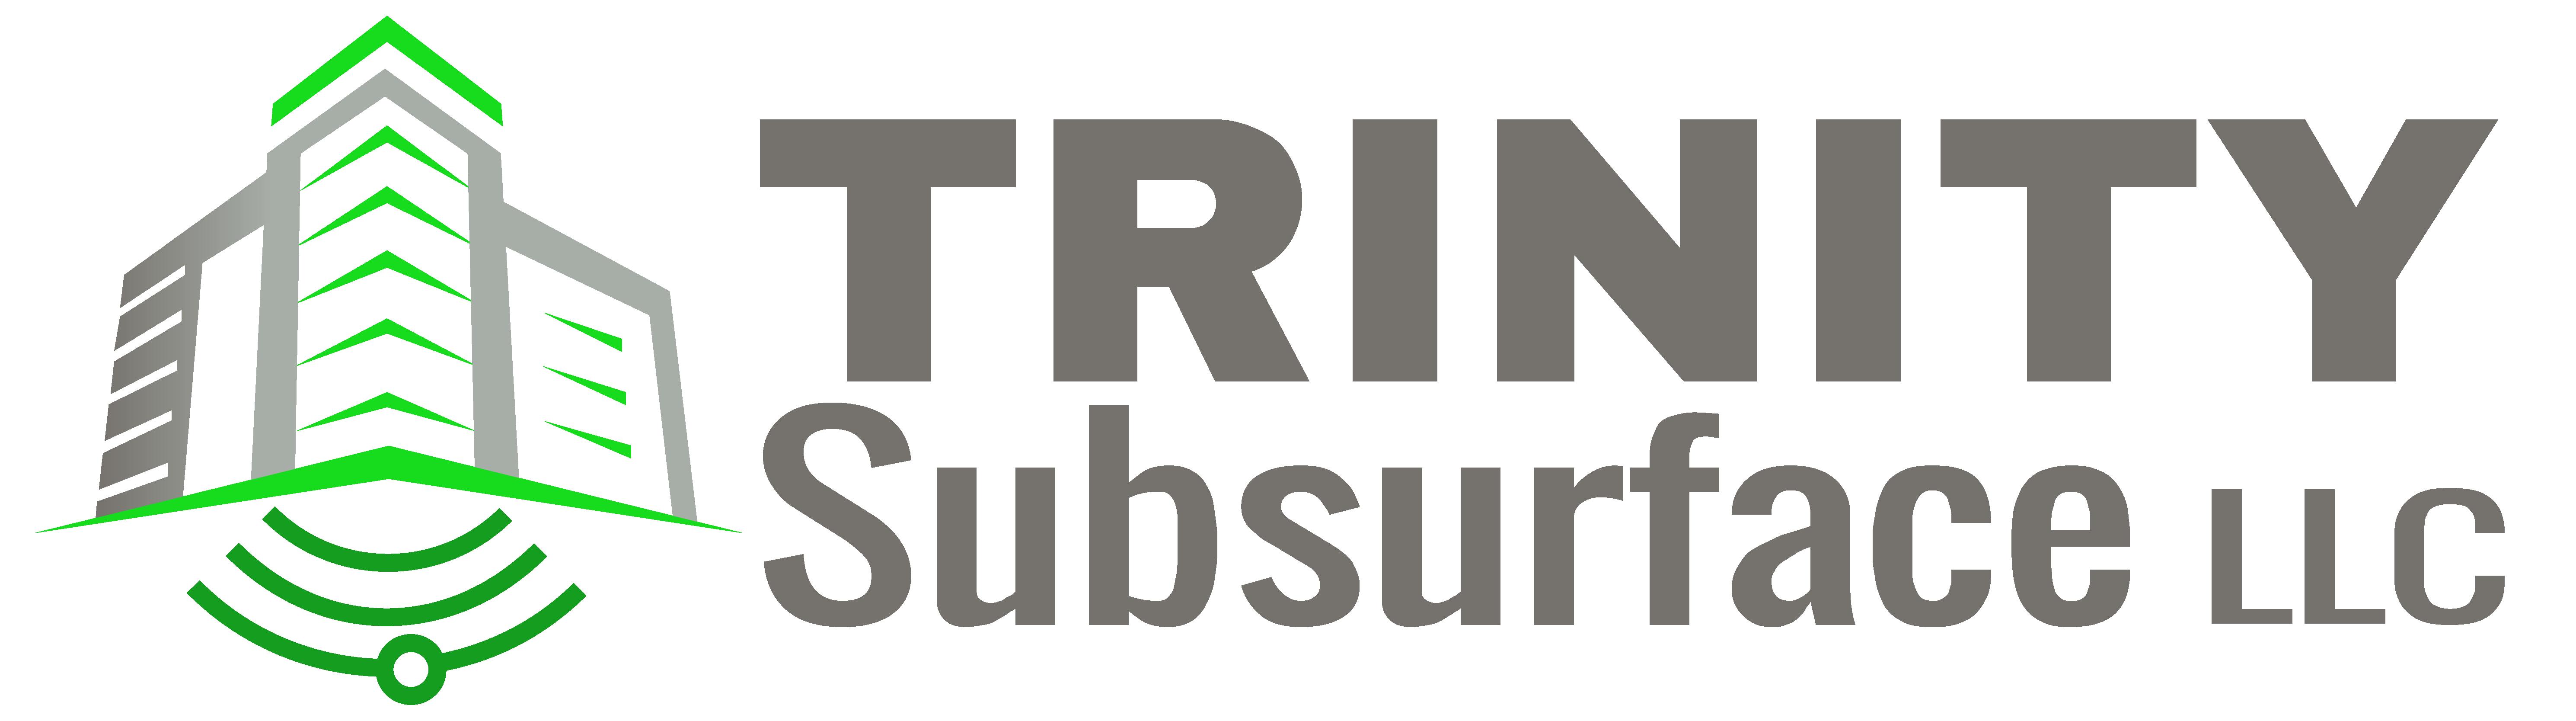 Trinity Subsurface, LLC logo